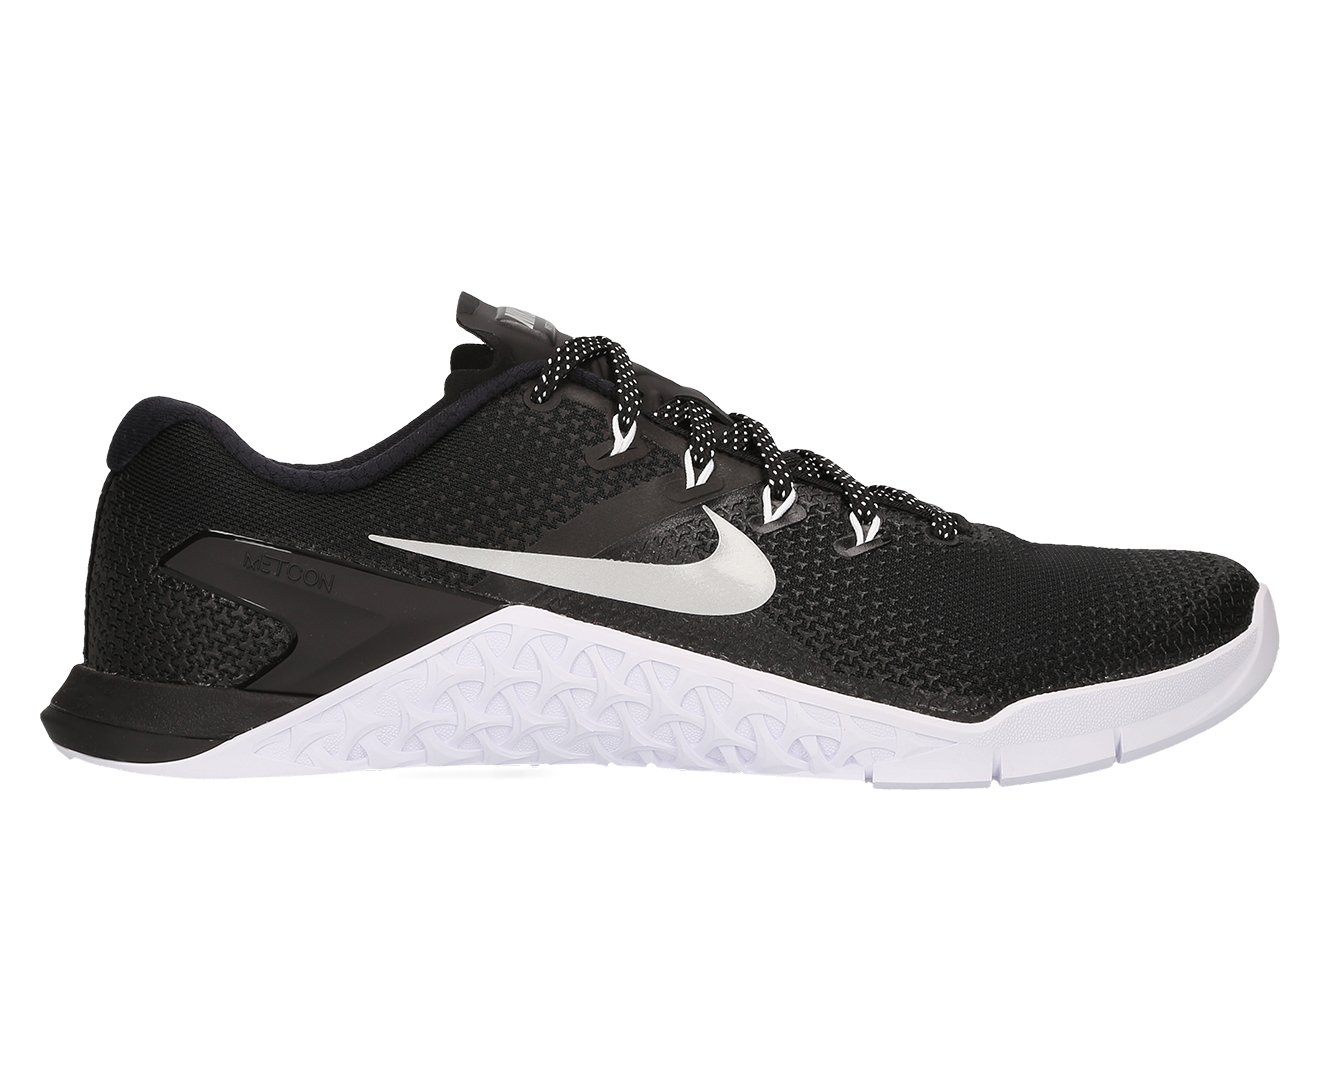 Nike Women's Metcon 4 Training Shoe (5 B(M) US, Black/Metallic Silver-White-Volt Glow)